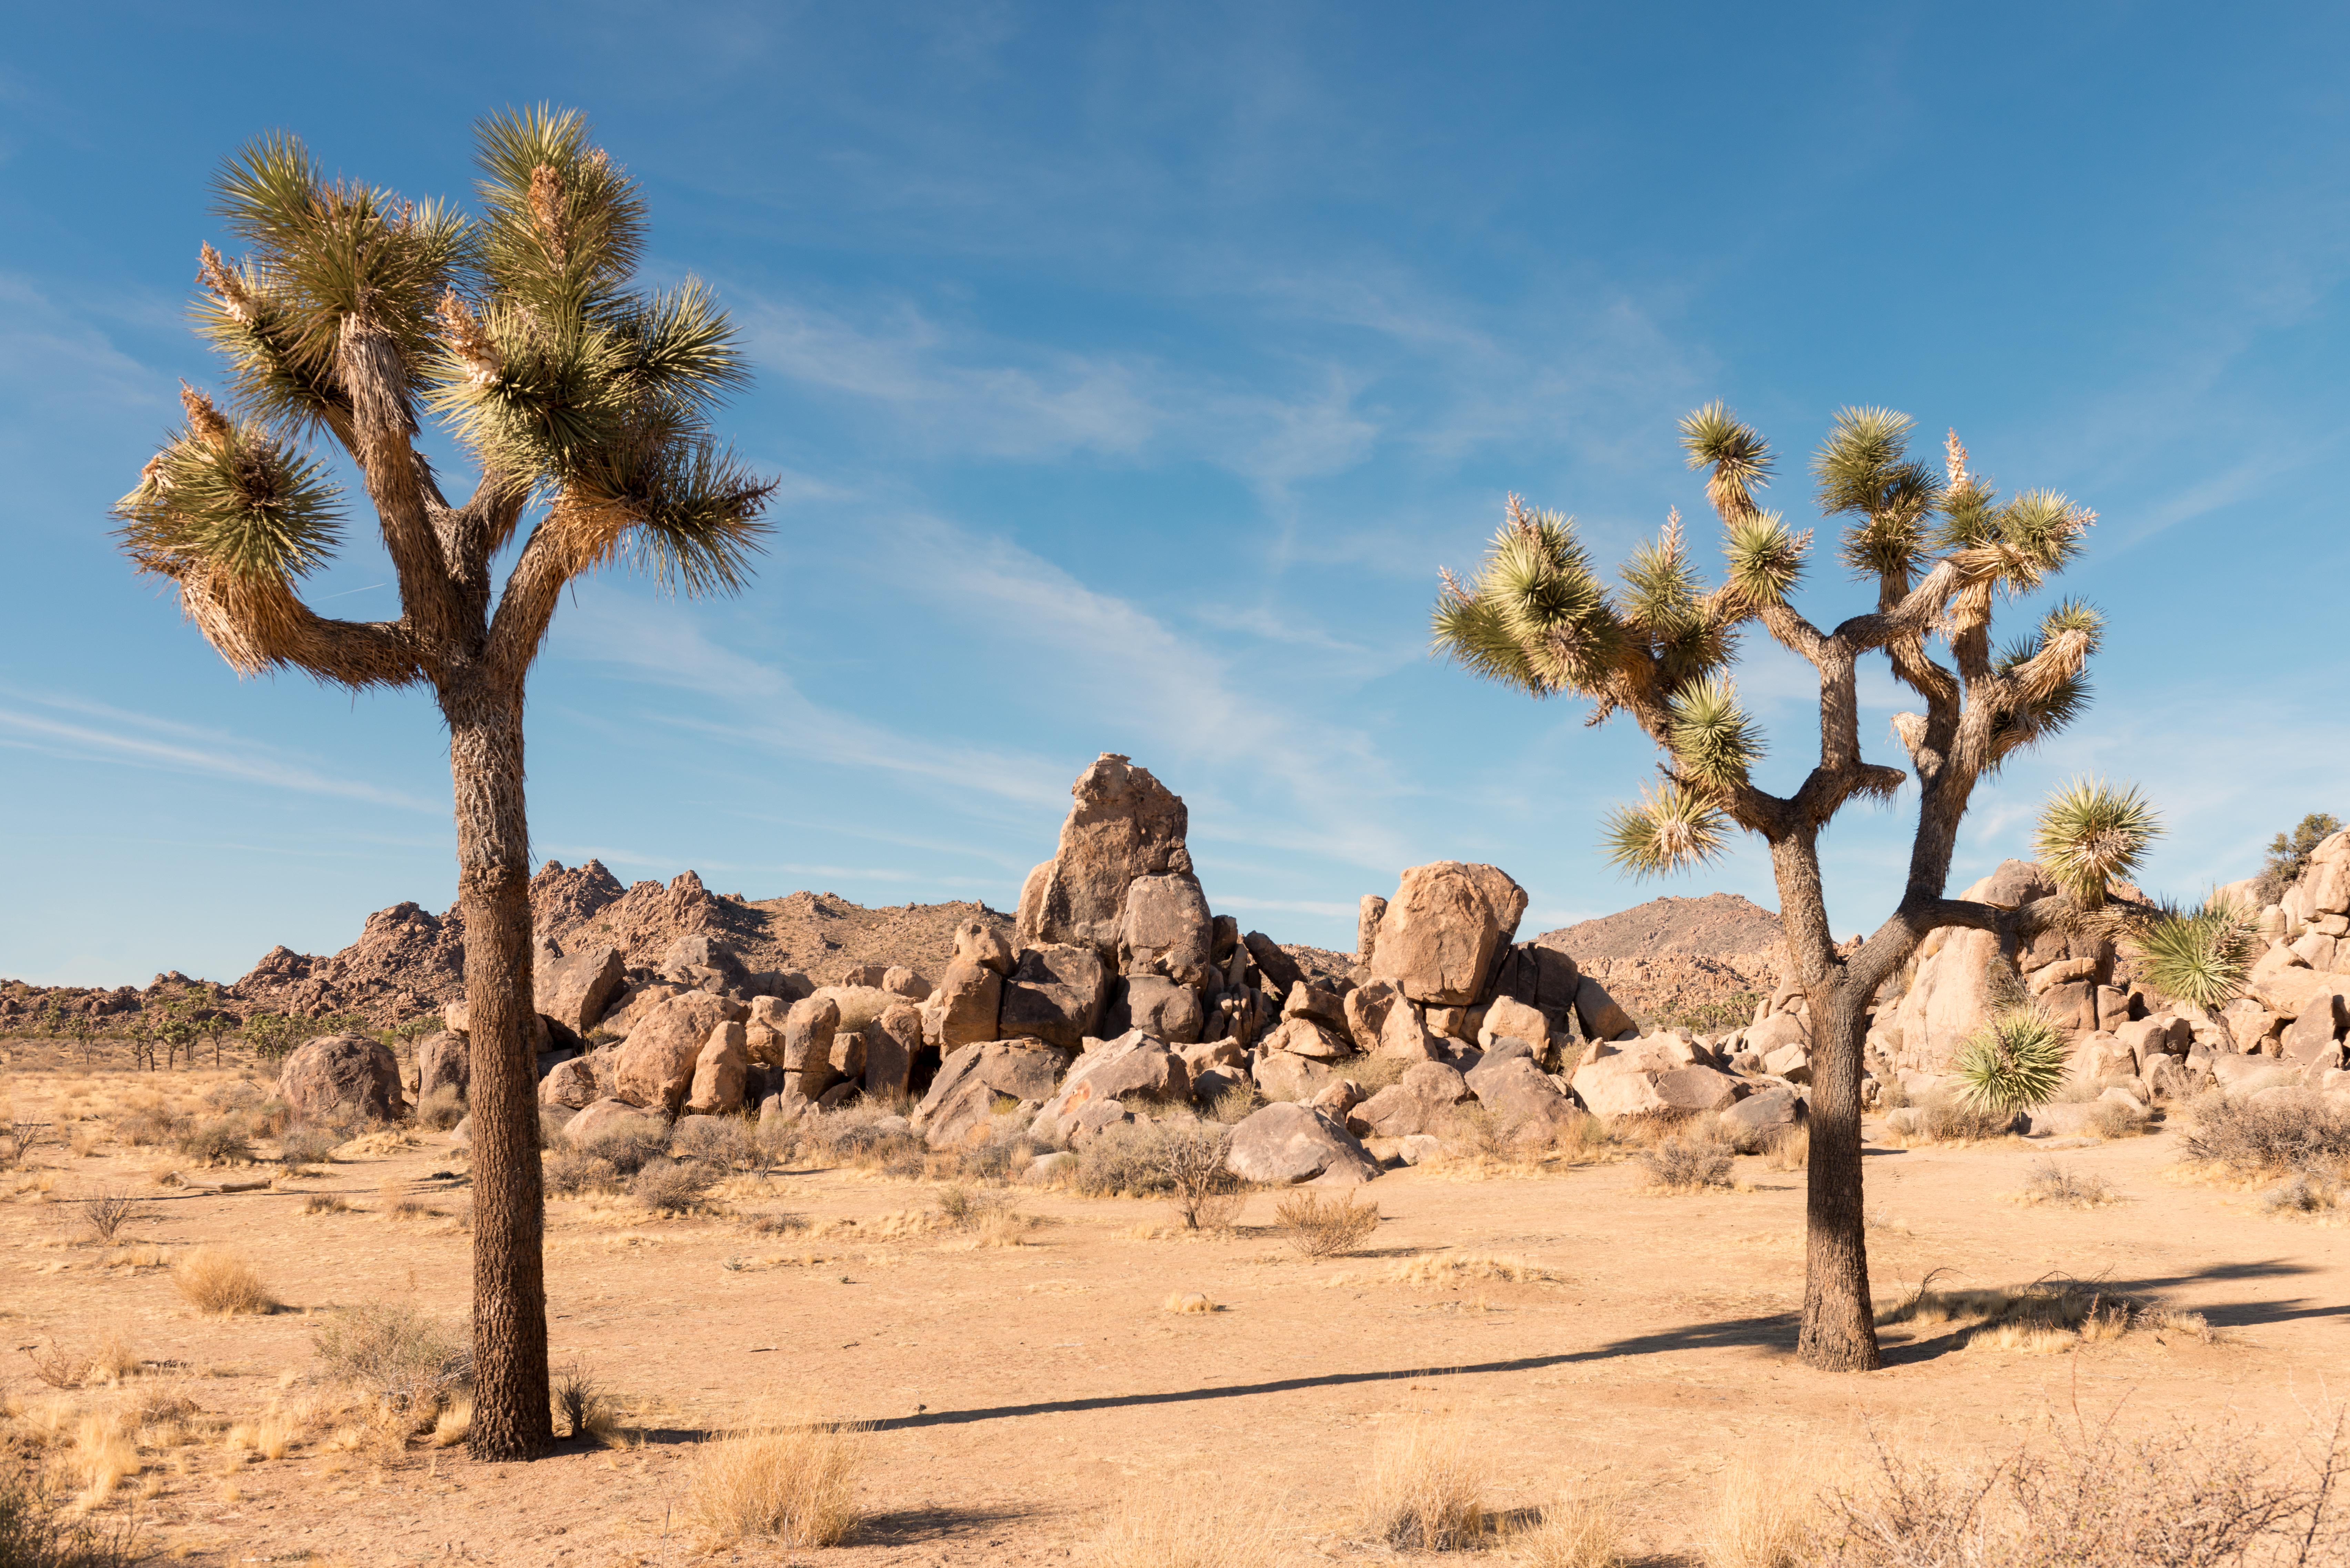 Joshua Trees and Rocks